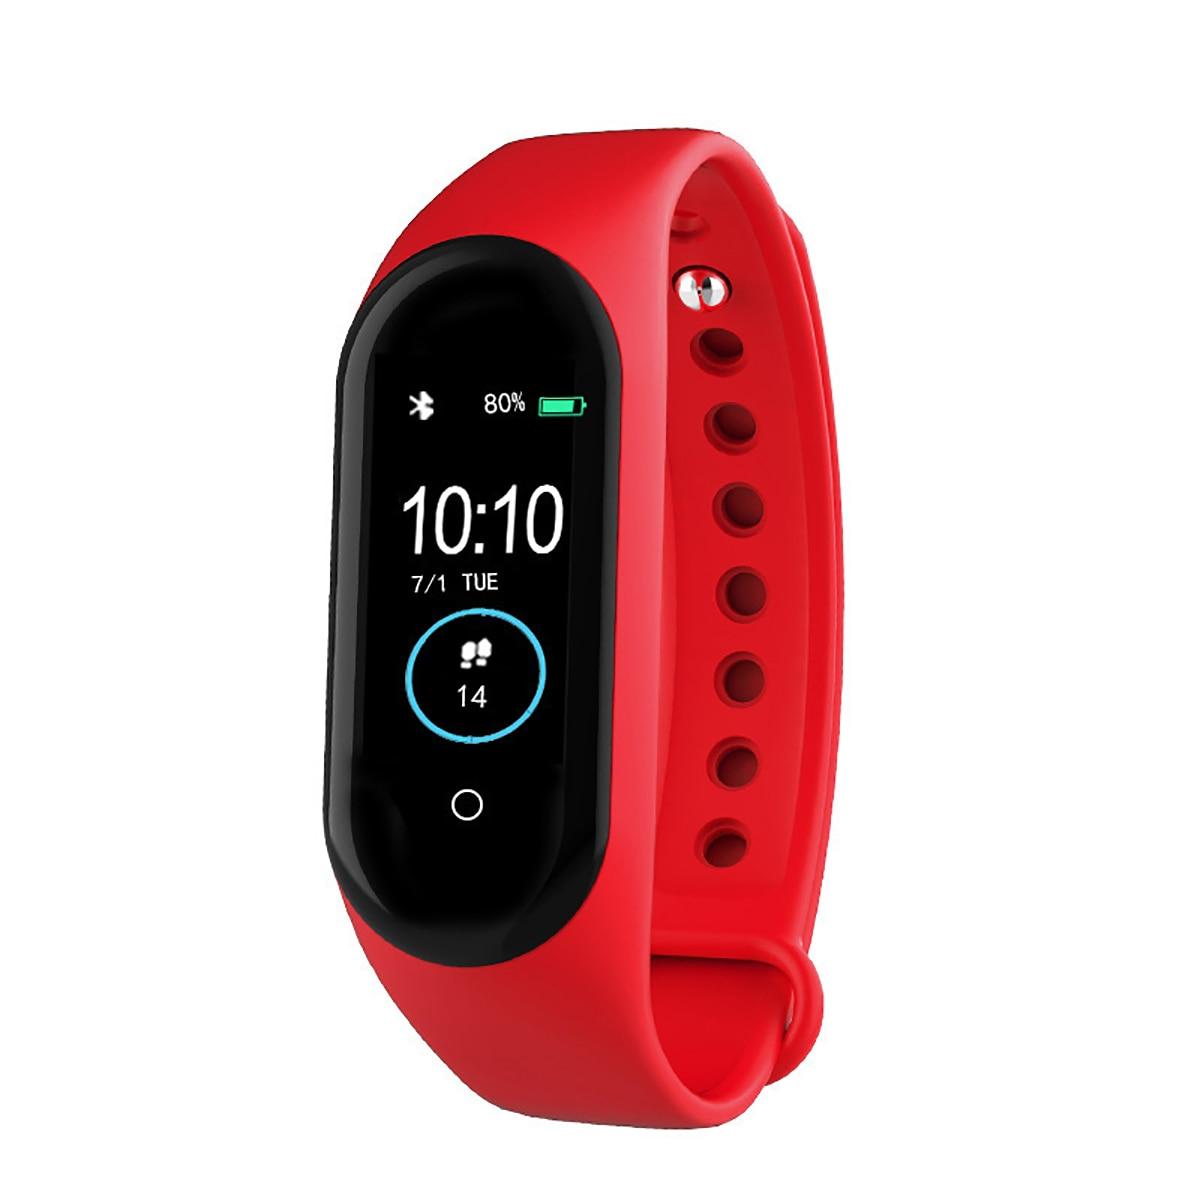 H32c4ea8795674b0a8f54ba29b0e5675bA New M4 Smart Band Fitness Tracker Smart Watch Sport Smart Bracelet Heart Rate Blood Pressure Smartband Monitor Health Wristband